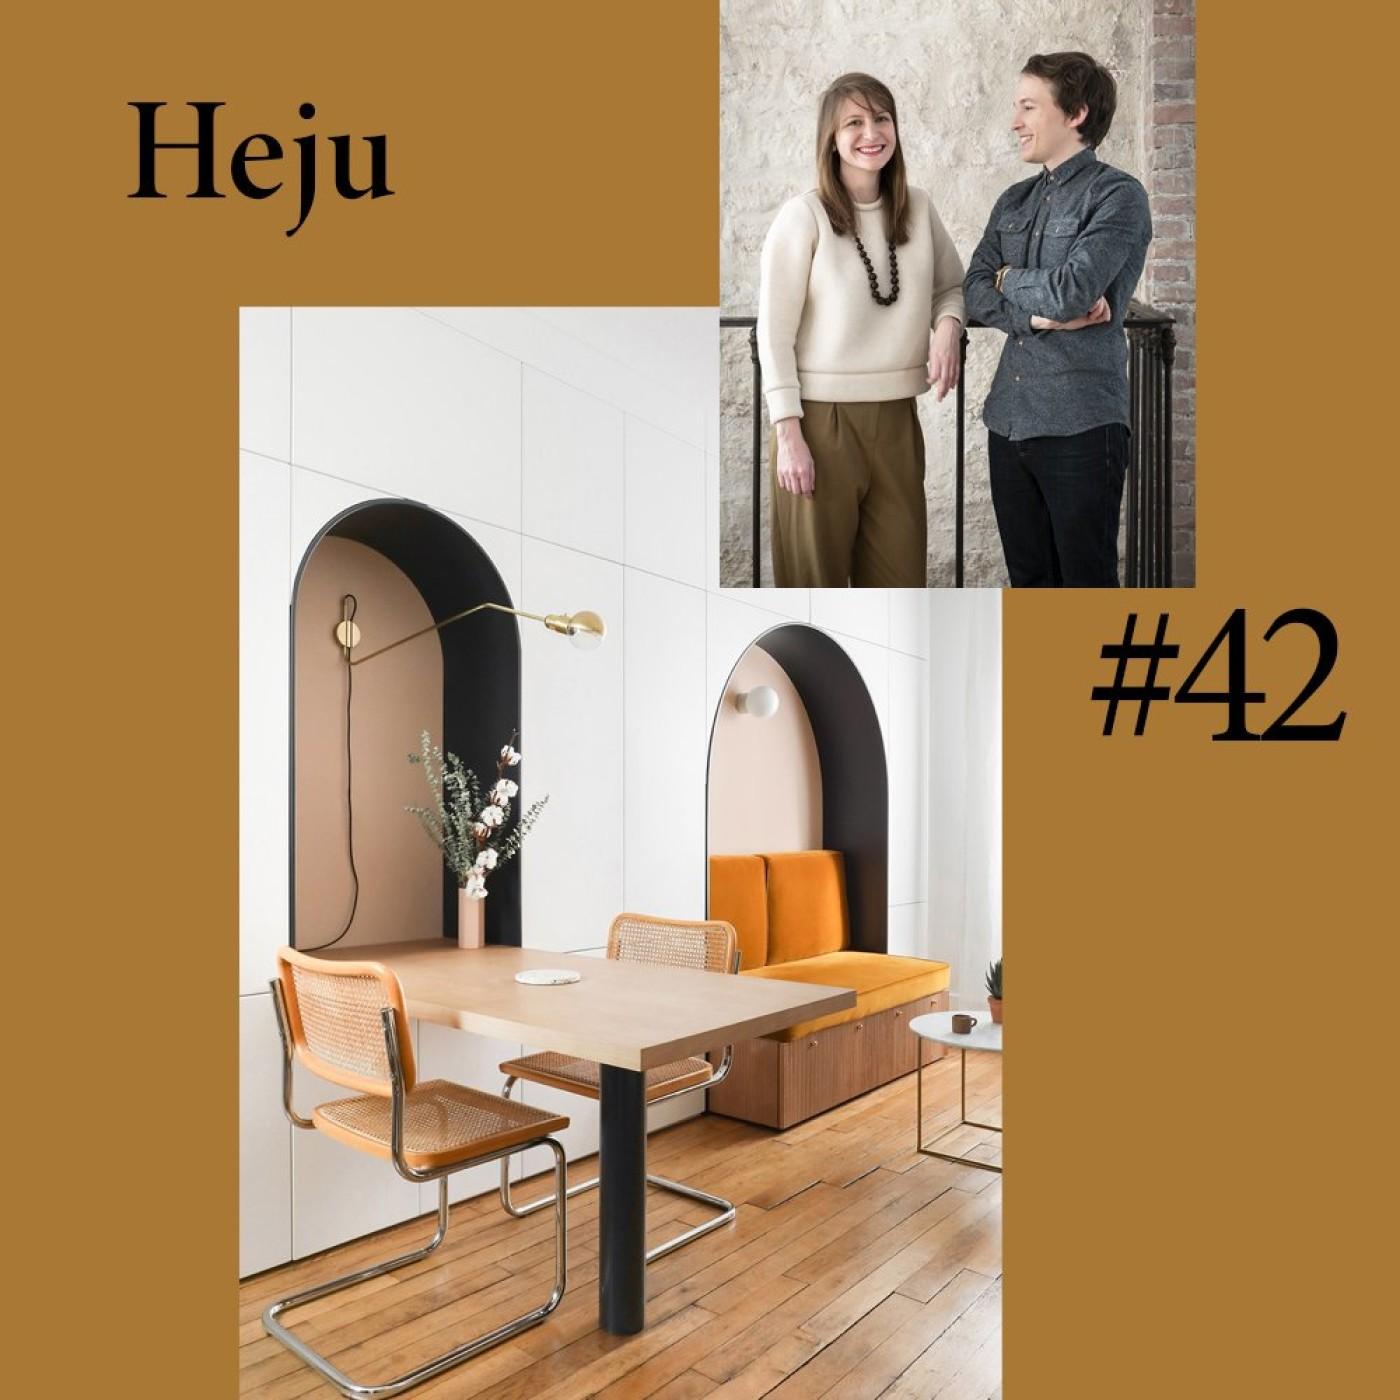 #42 Heju (Hélène Pinaud et Julien Schwartzmann)